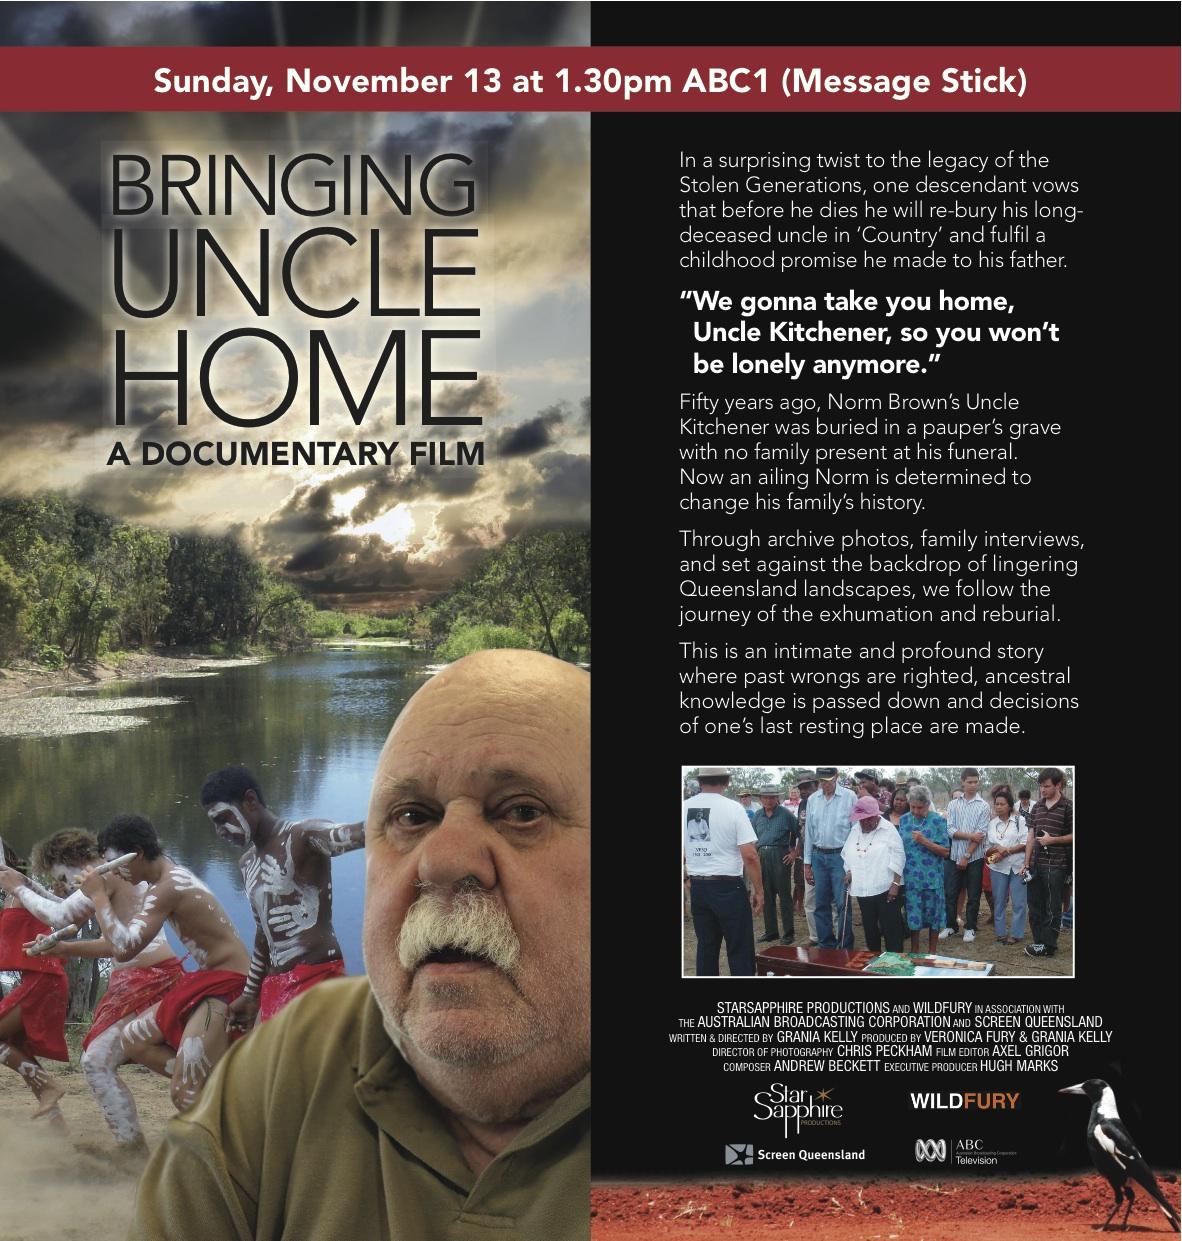 Bringing Uncle Home